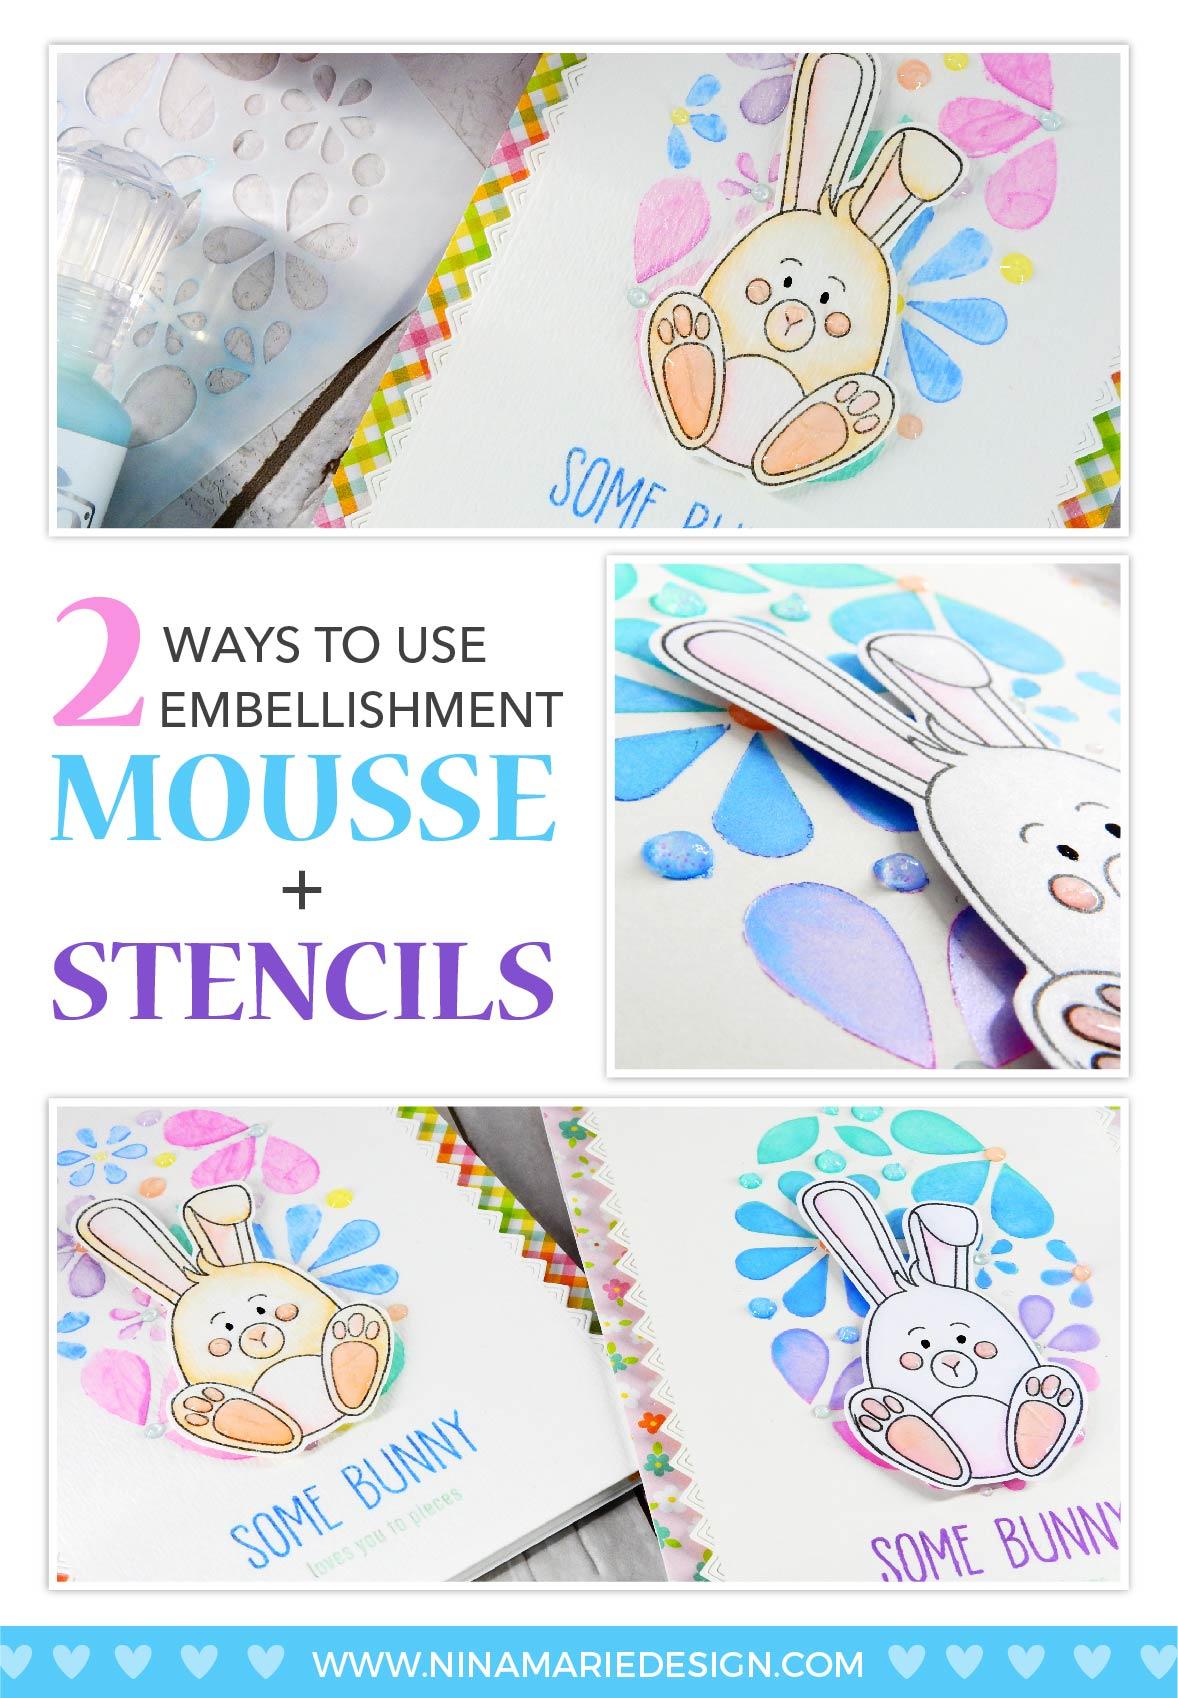 Embellishment Mousse Two Ways + Simon Card Kit   Nina-Marie Design